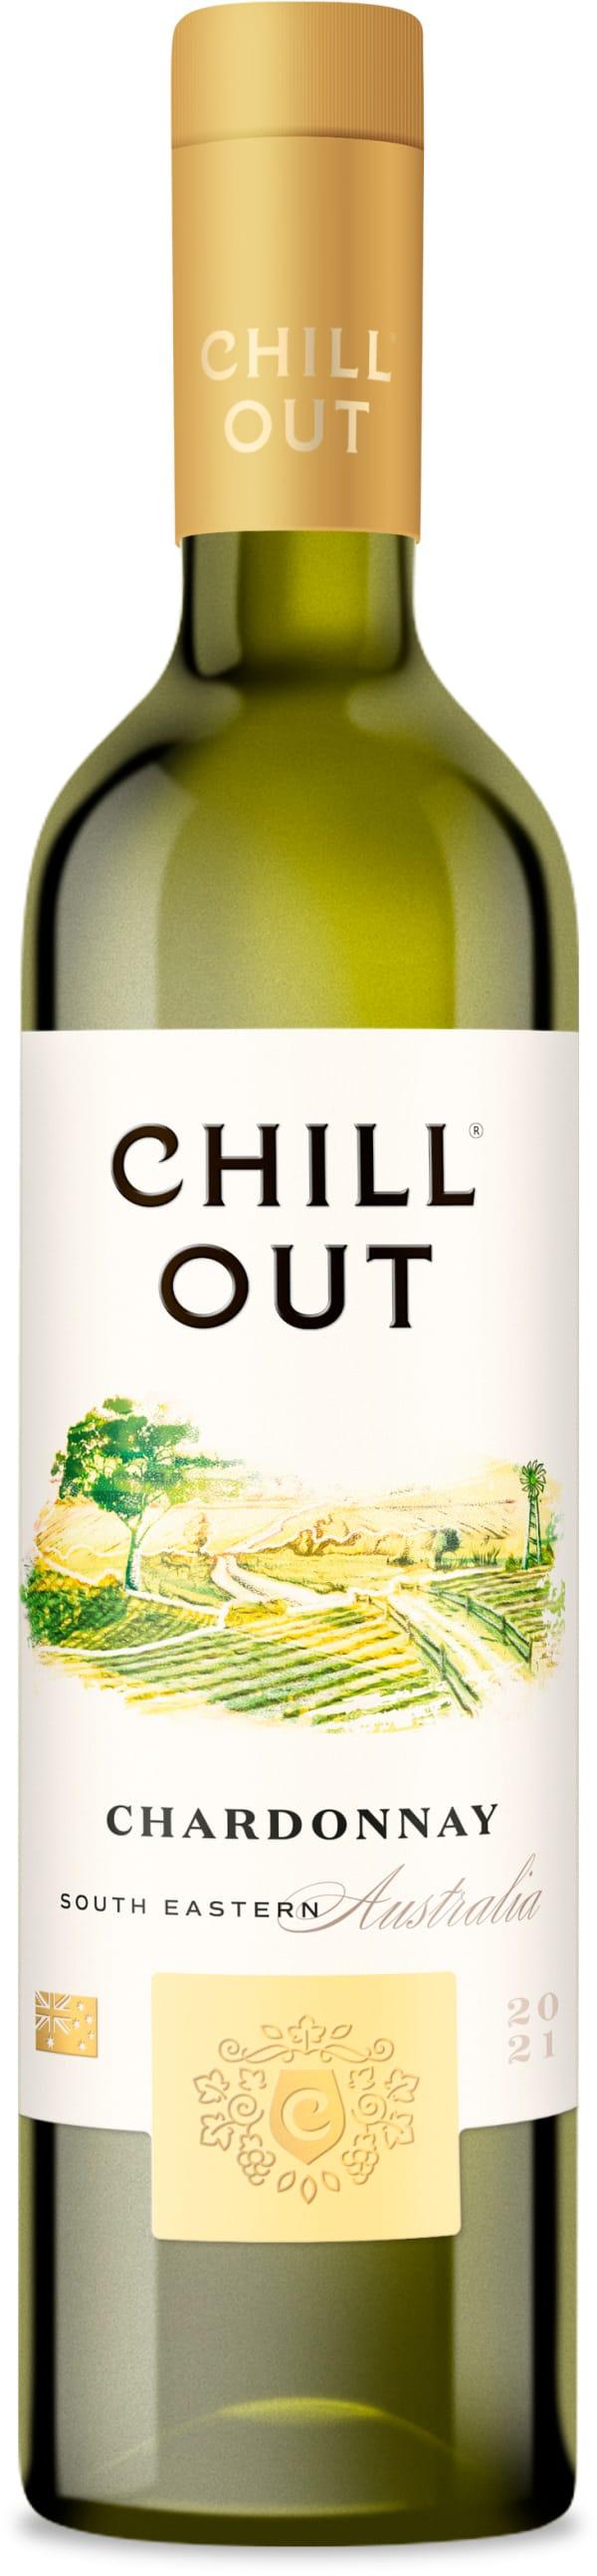 Chill Out Chardonnay Australia 2018 plastflaska